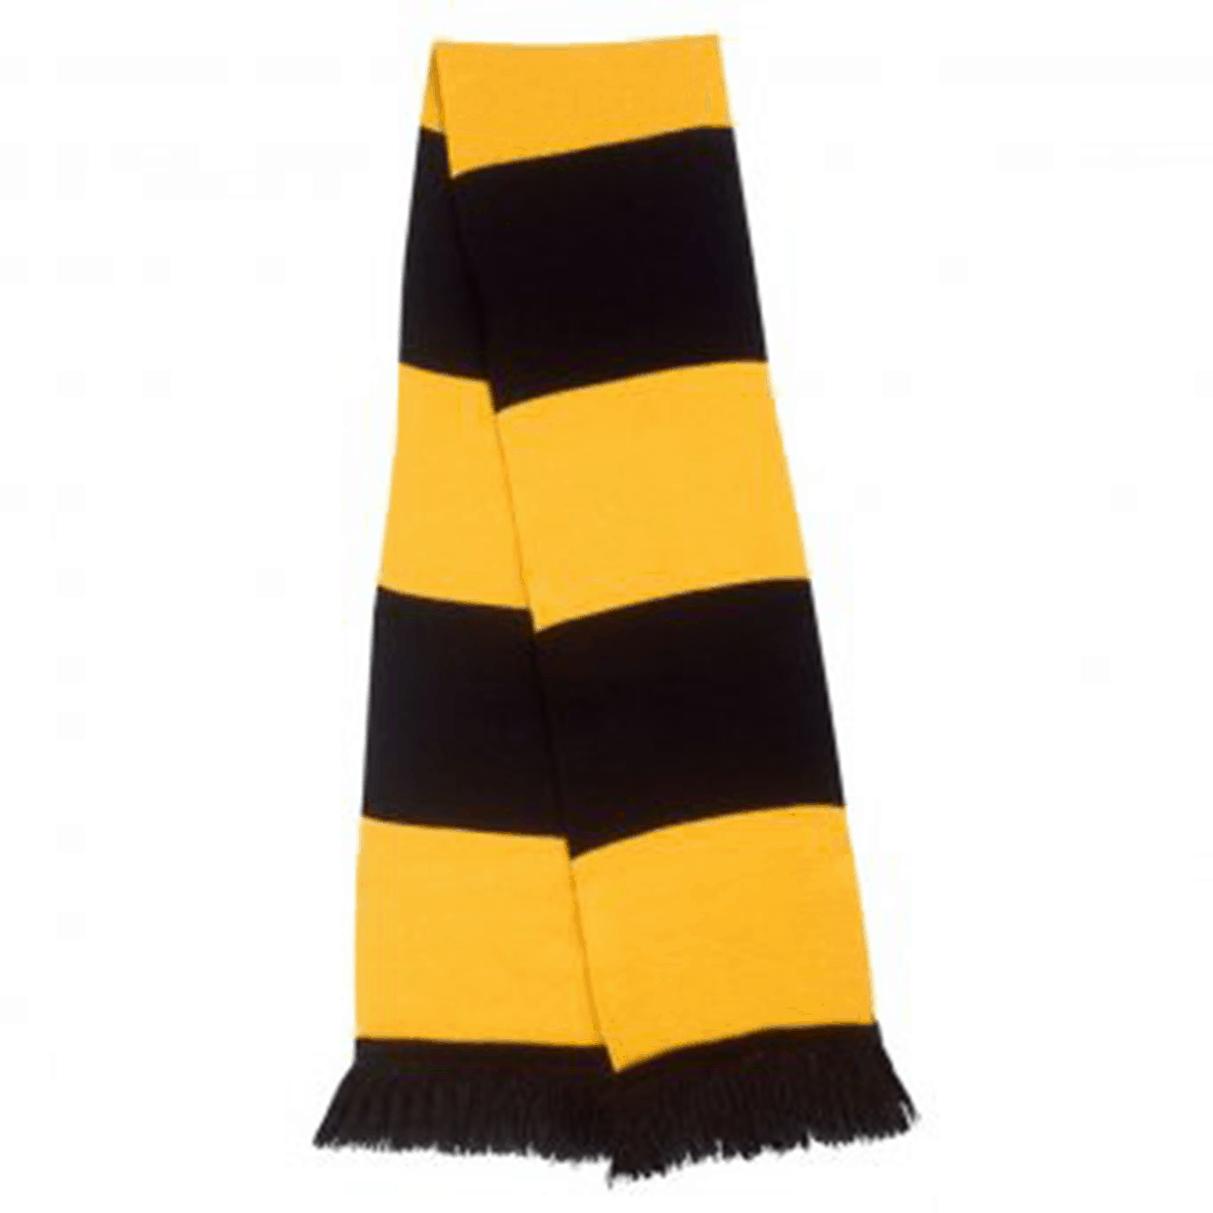 Supporter's Scarf   SWAZ Teamwear   Football Kit Supplier